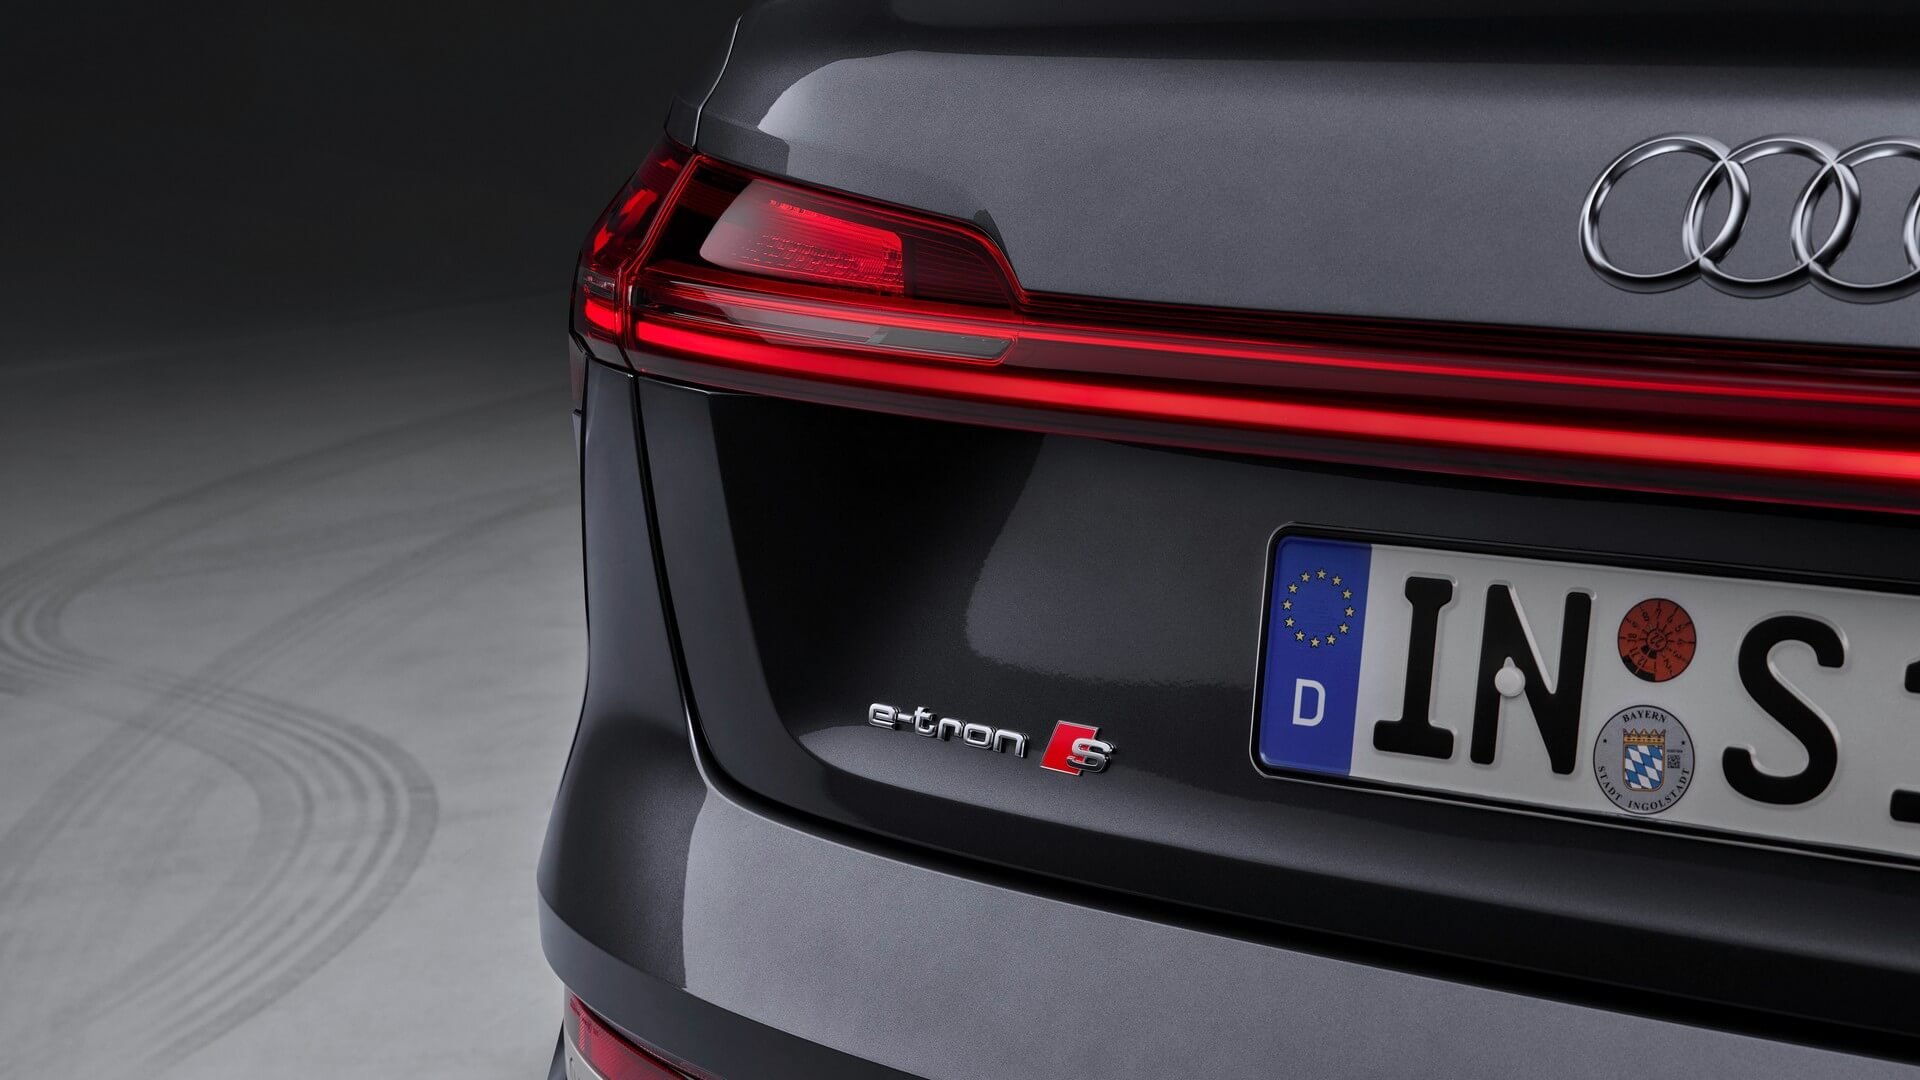 Audi-E-Tron-S-and-E-Tron-S-Sportback-2020-88